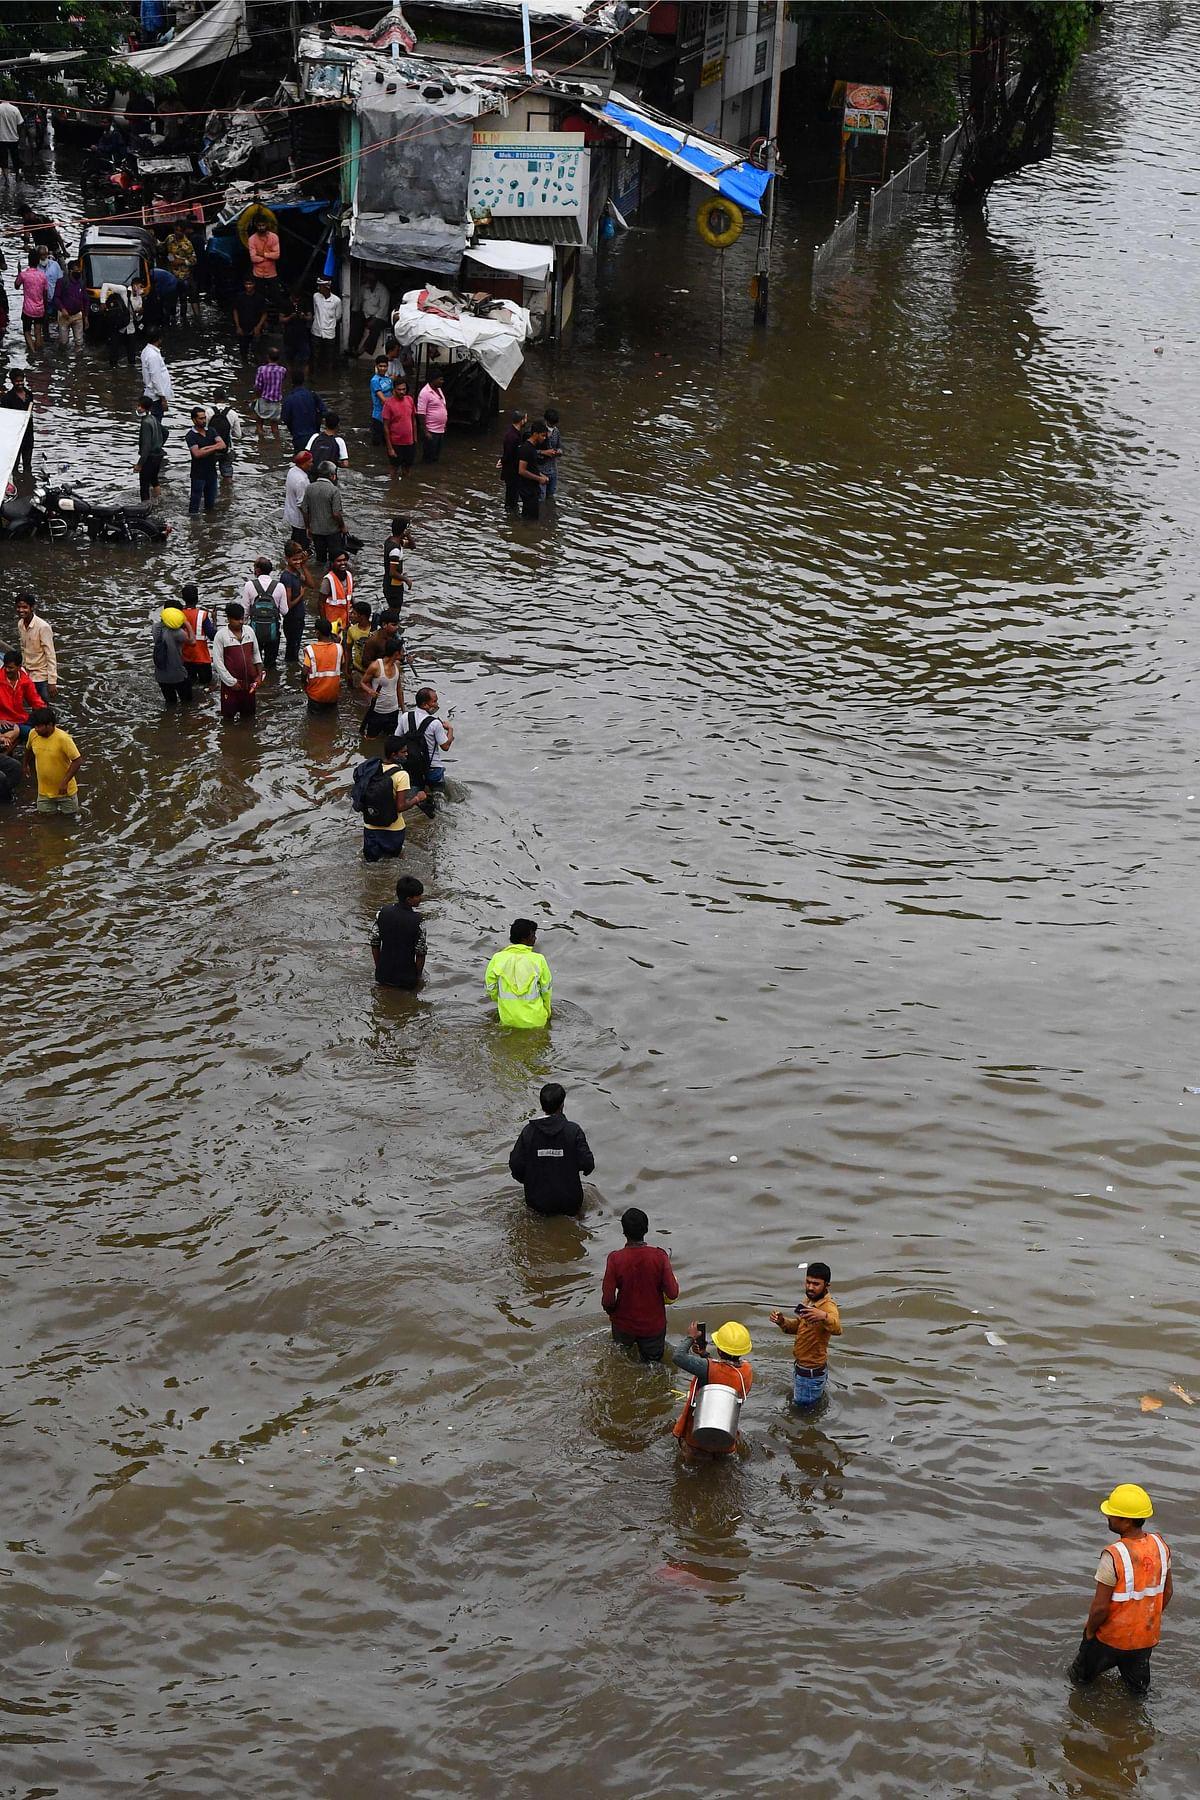 People wade along a waterlogged street following a heavy monsoon rainfall in Mumbai on July 16, 2021.